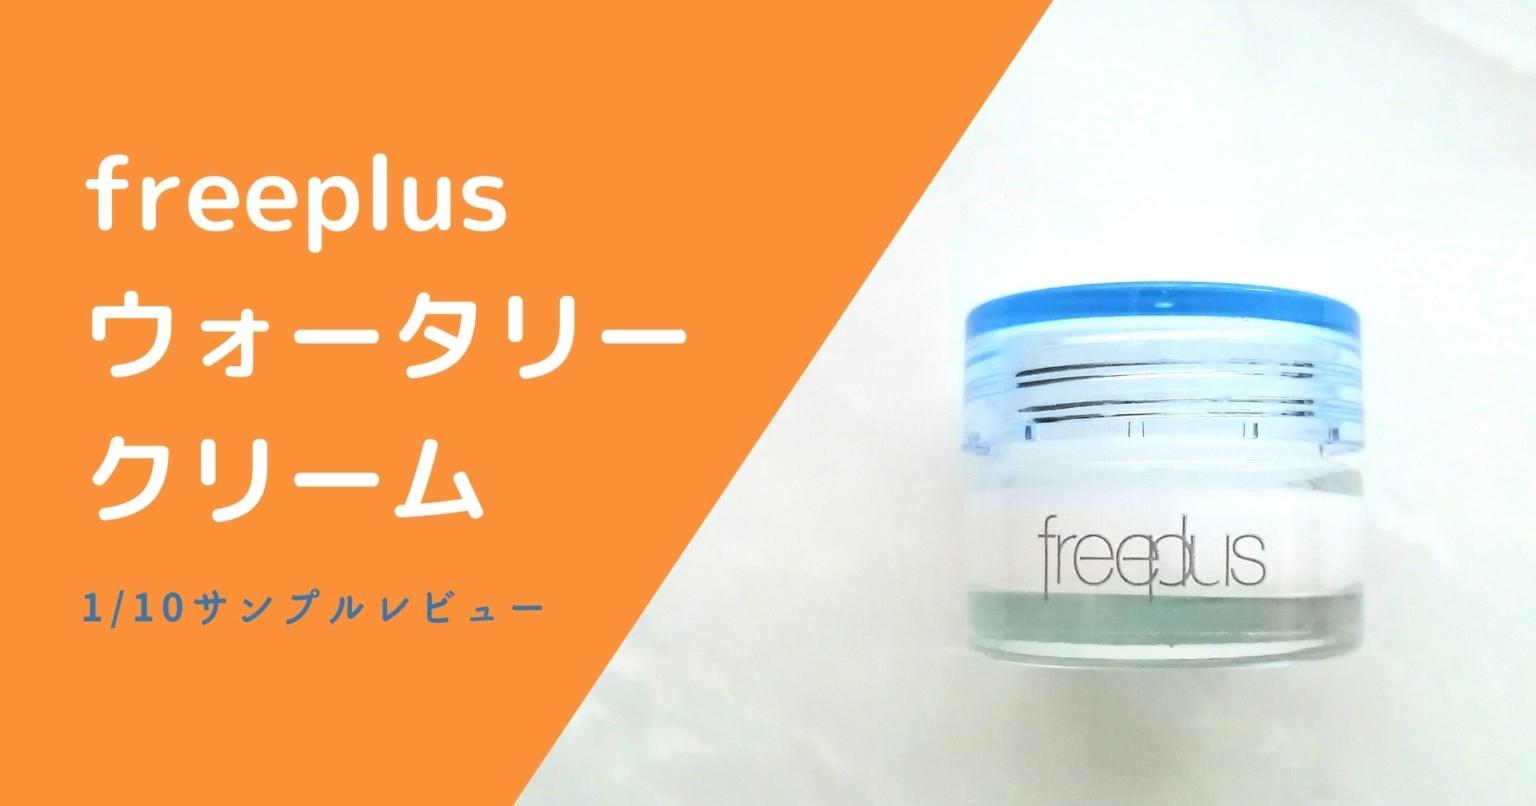 freeplus_アイキャッチ